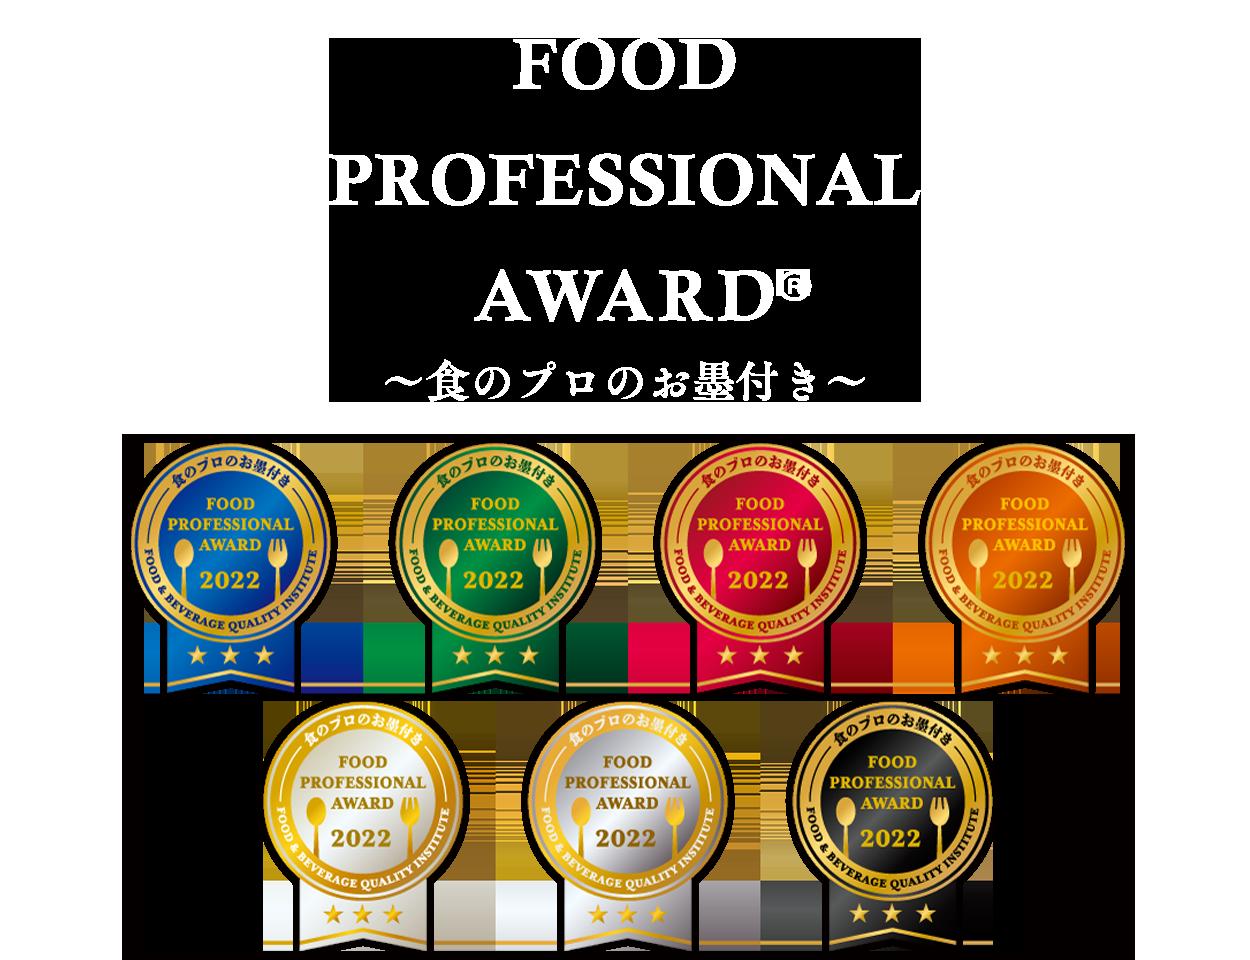 FOOD PROFESSIONAL AWARD – 食のプロが食品、飲料、飲食店メニューを審査する品評機関